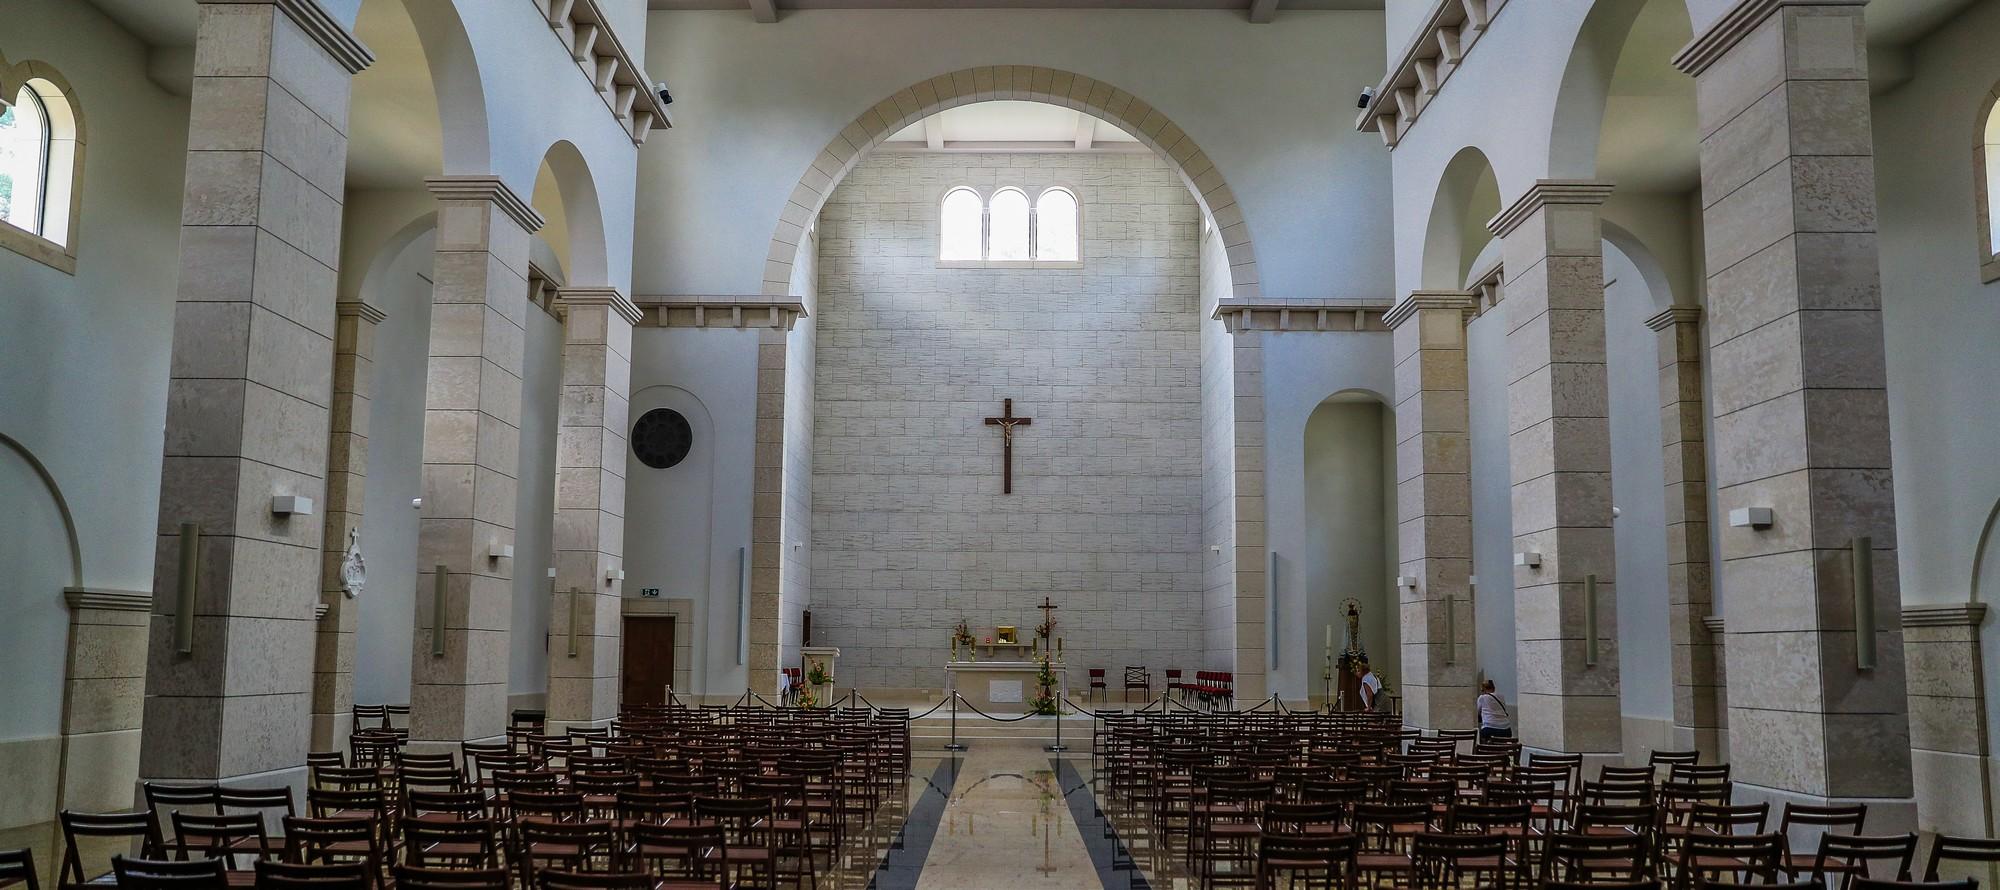 Sanktuarium Matki Bożej Loretańskiej